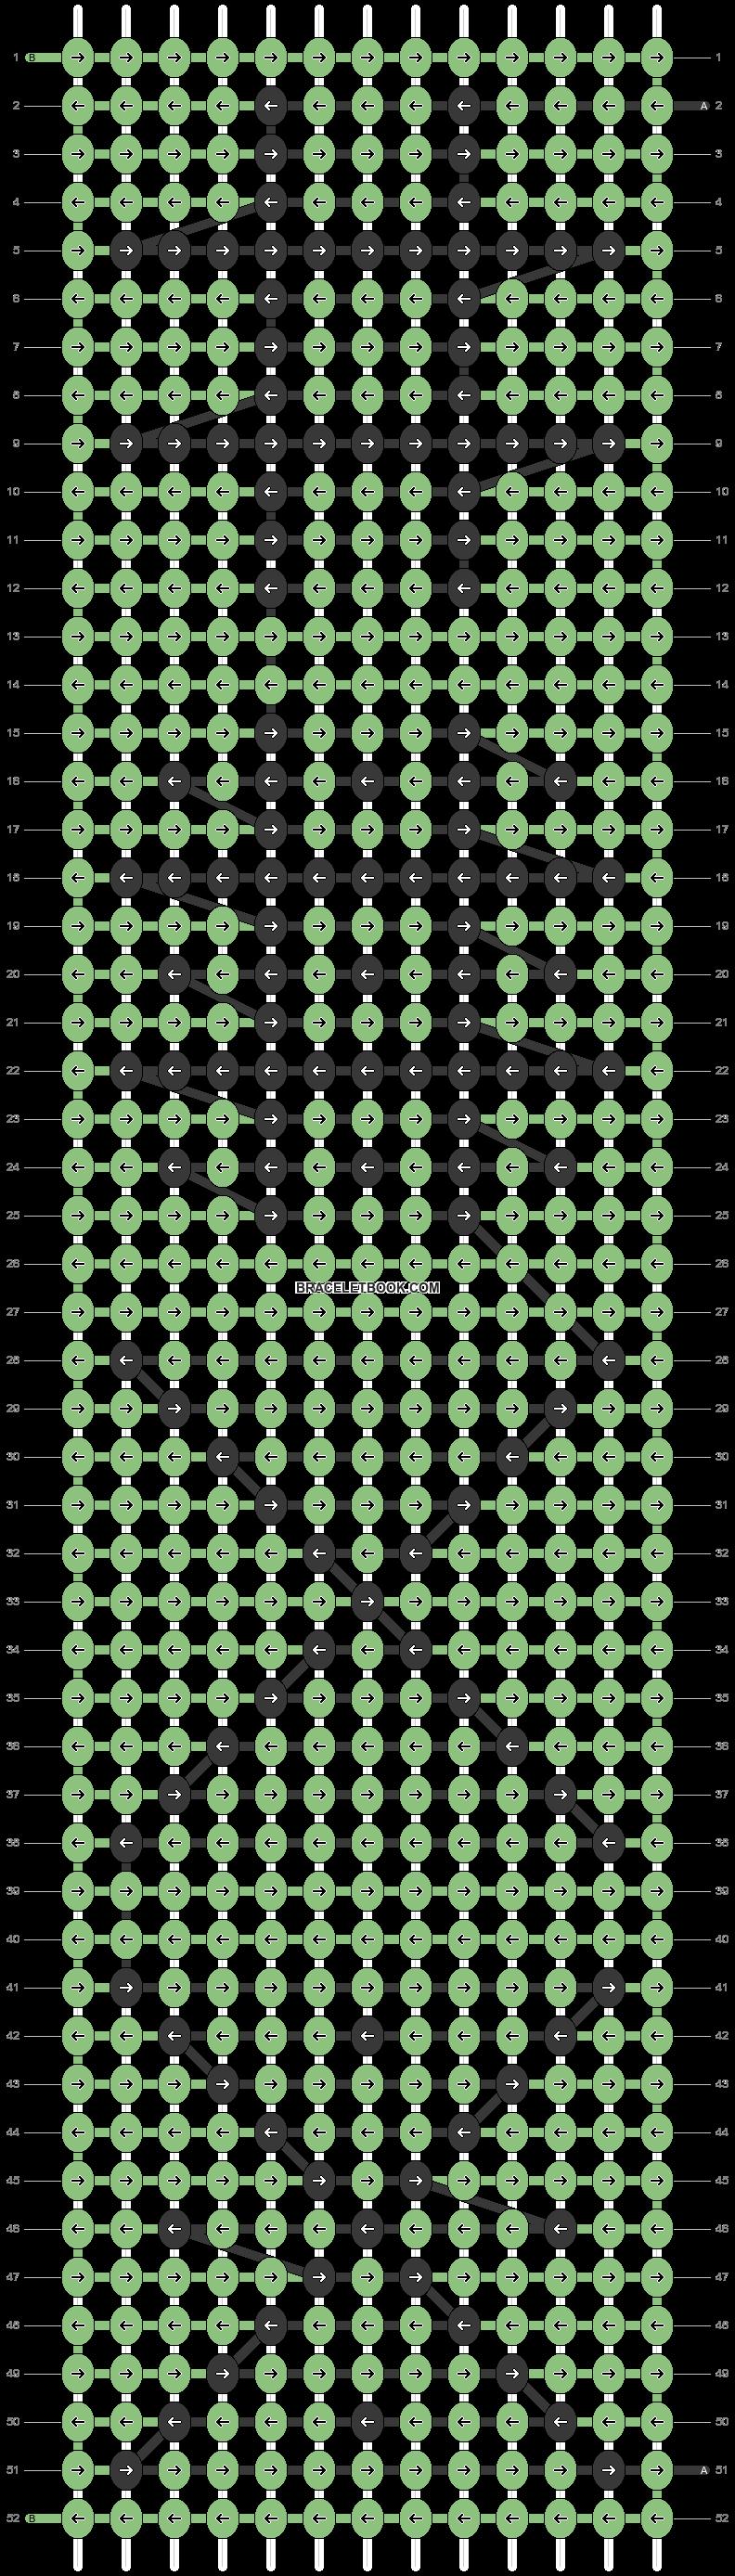 Alpha pattern #55312 pattern